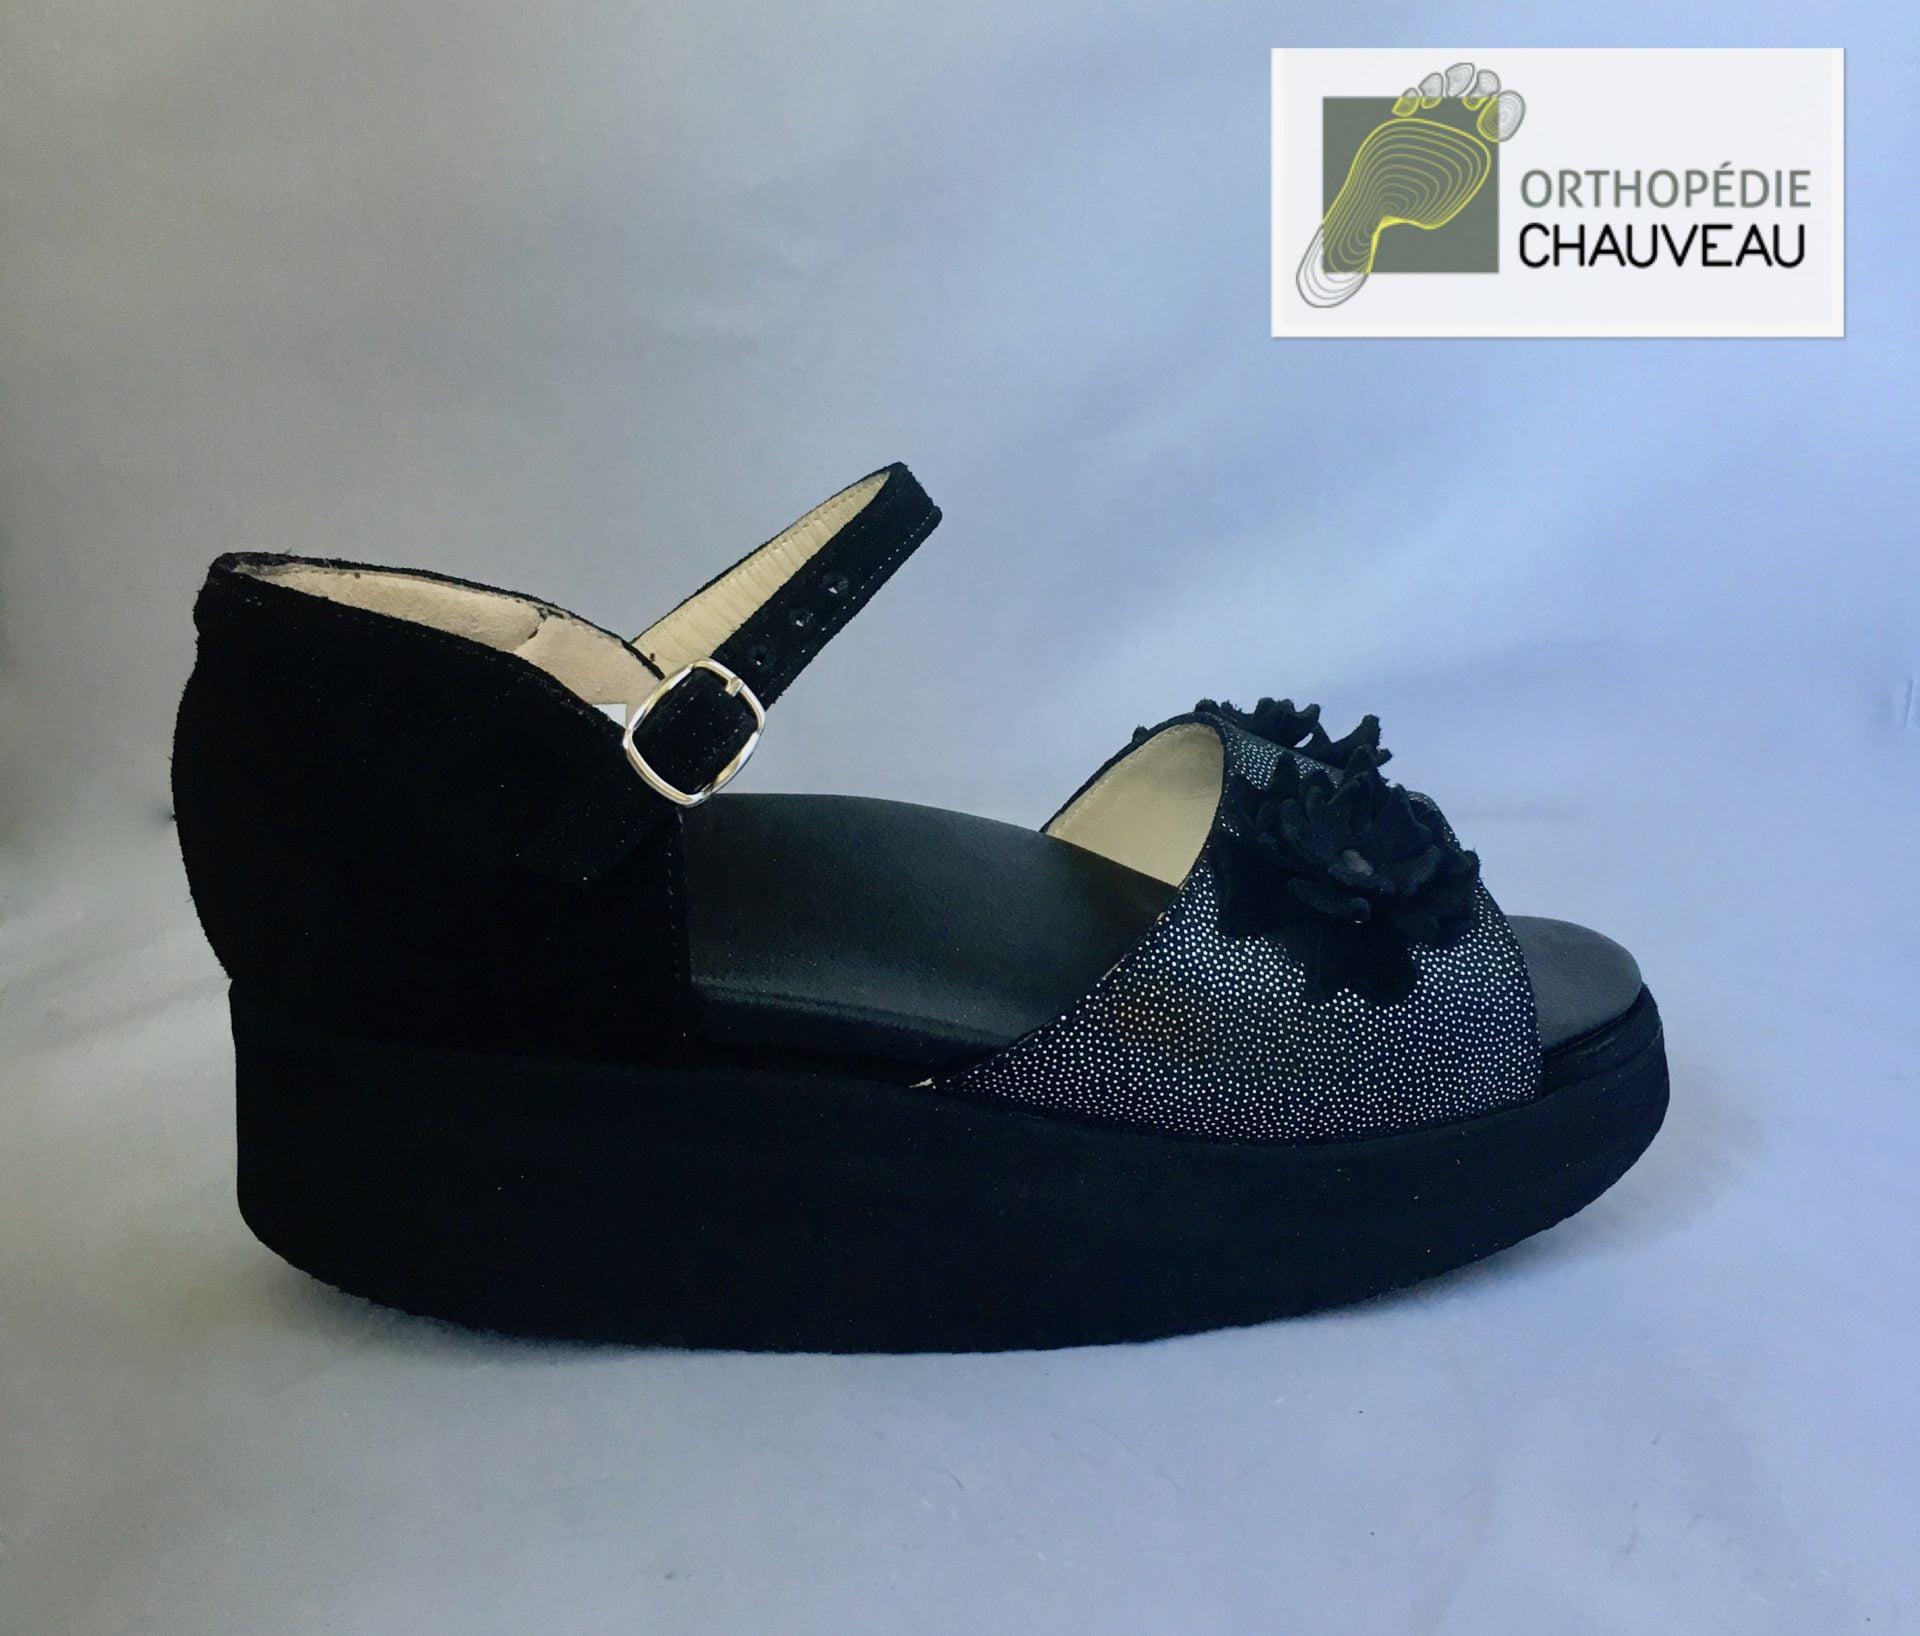 chaussures orthopediques Rennes roulement bateau